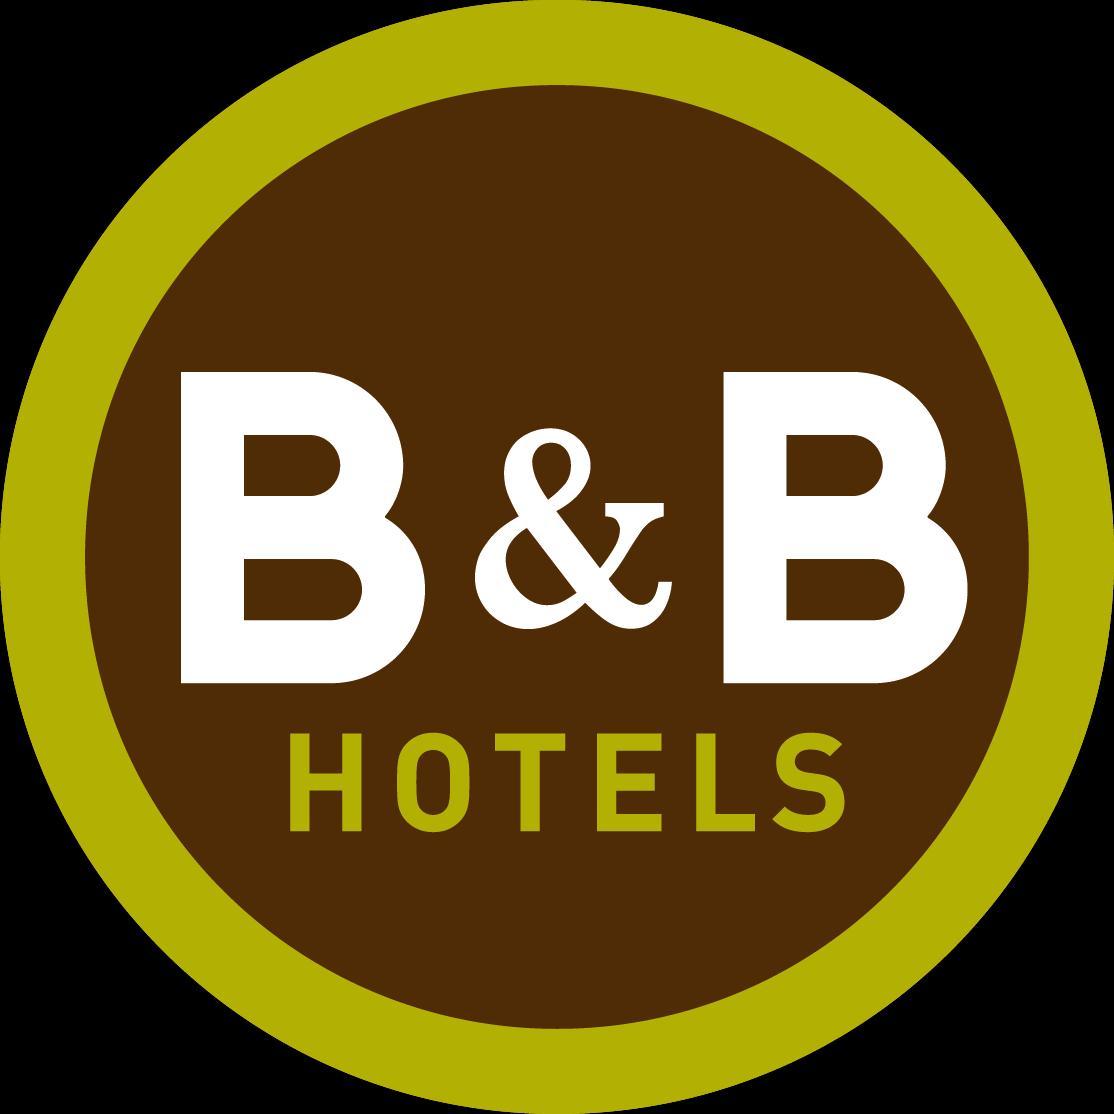 B&b Hotel Tours